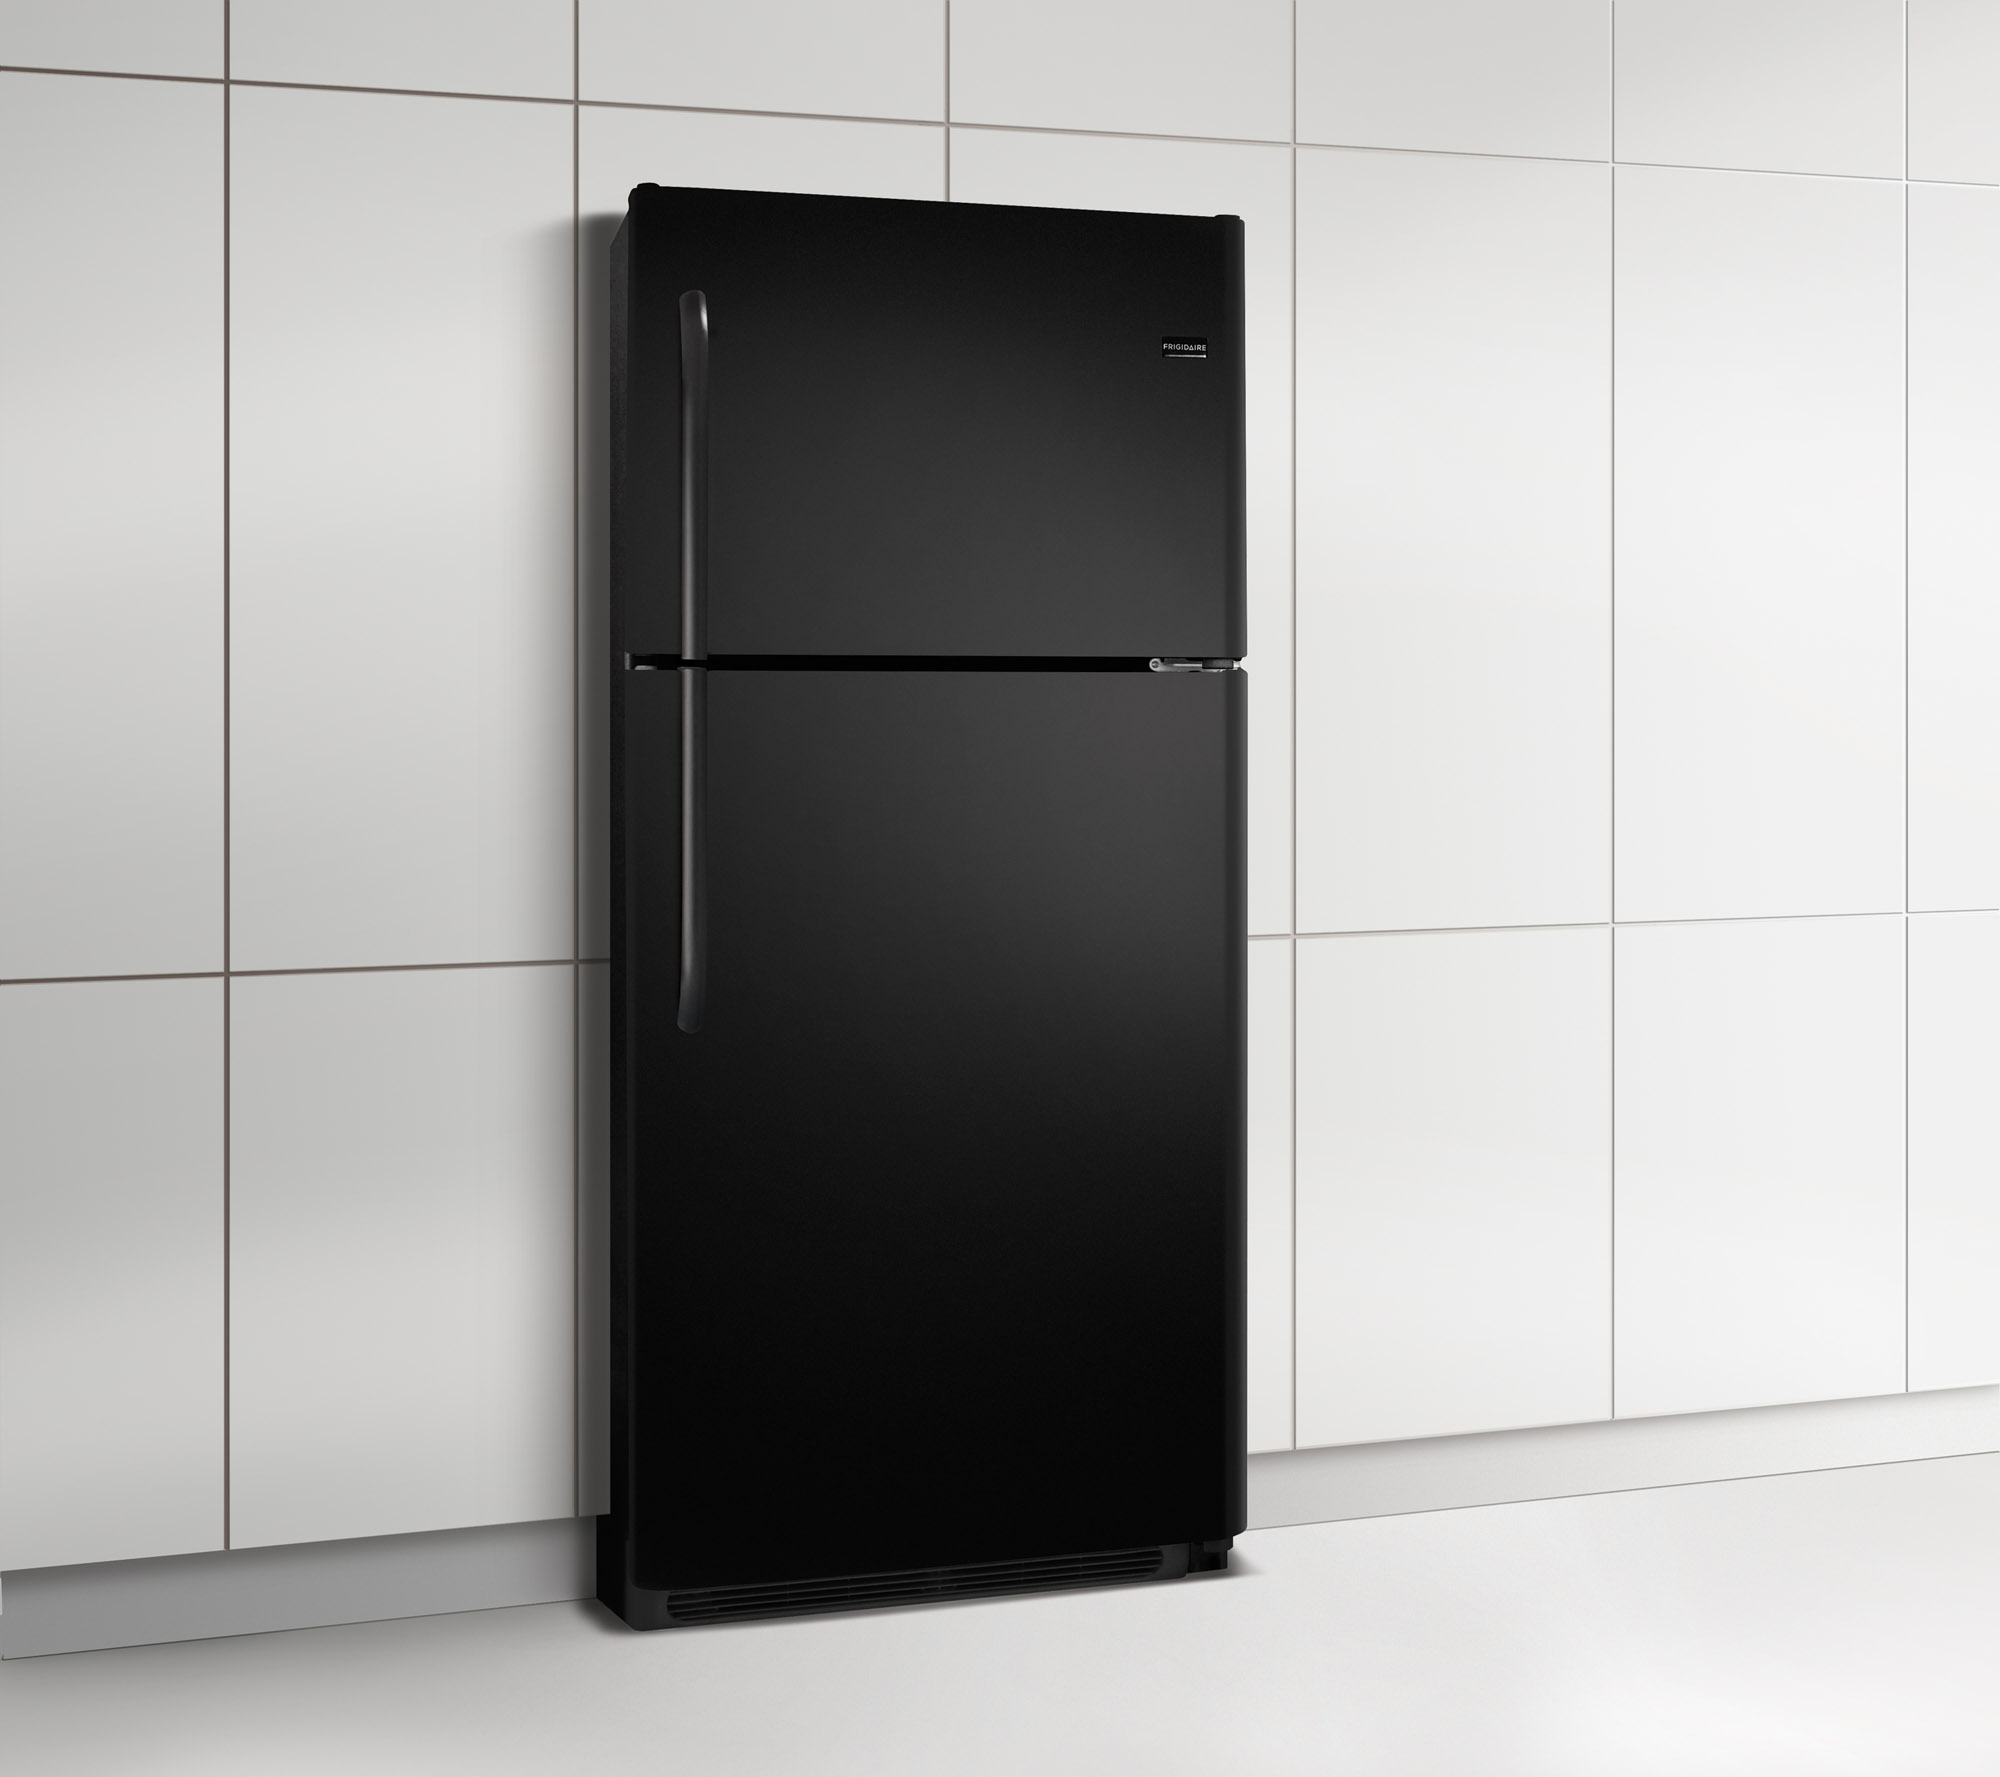 Frigidaire FFTR2131QE 20.5 cu. ft. Top Freezer Refrigerator -  Black